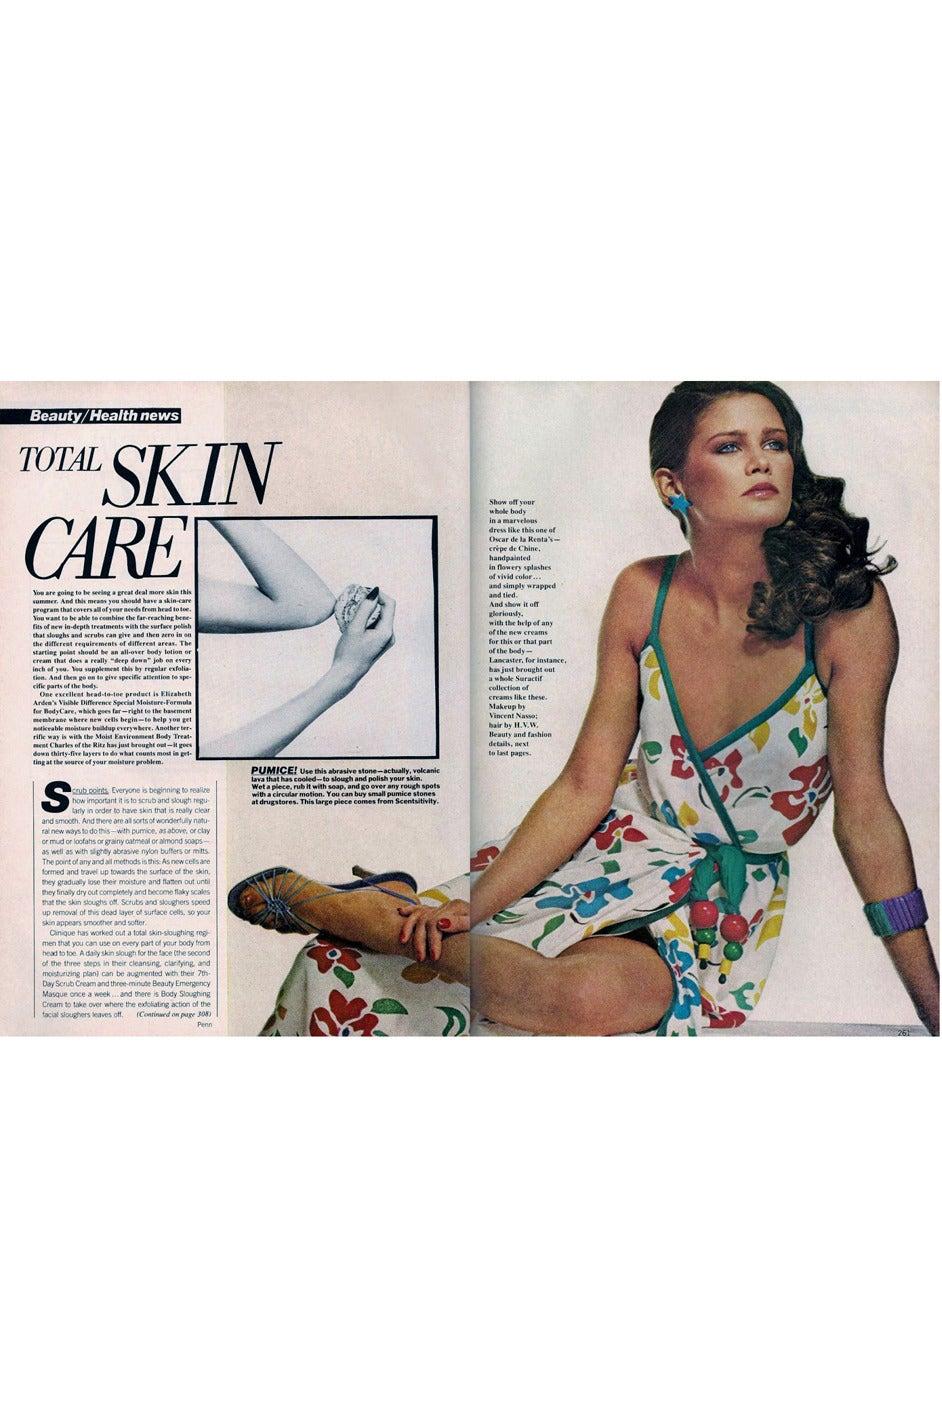 1979 Oscar De La Renta Dress as Seen in Vogue 9